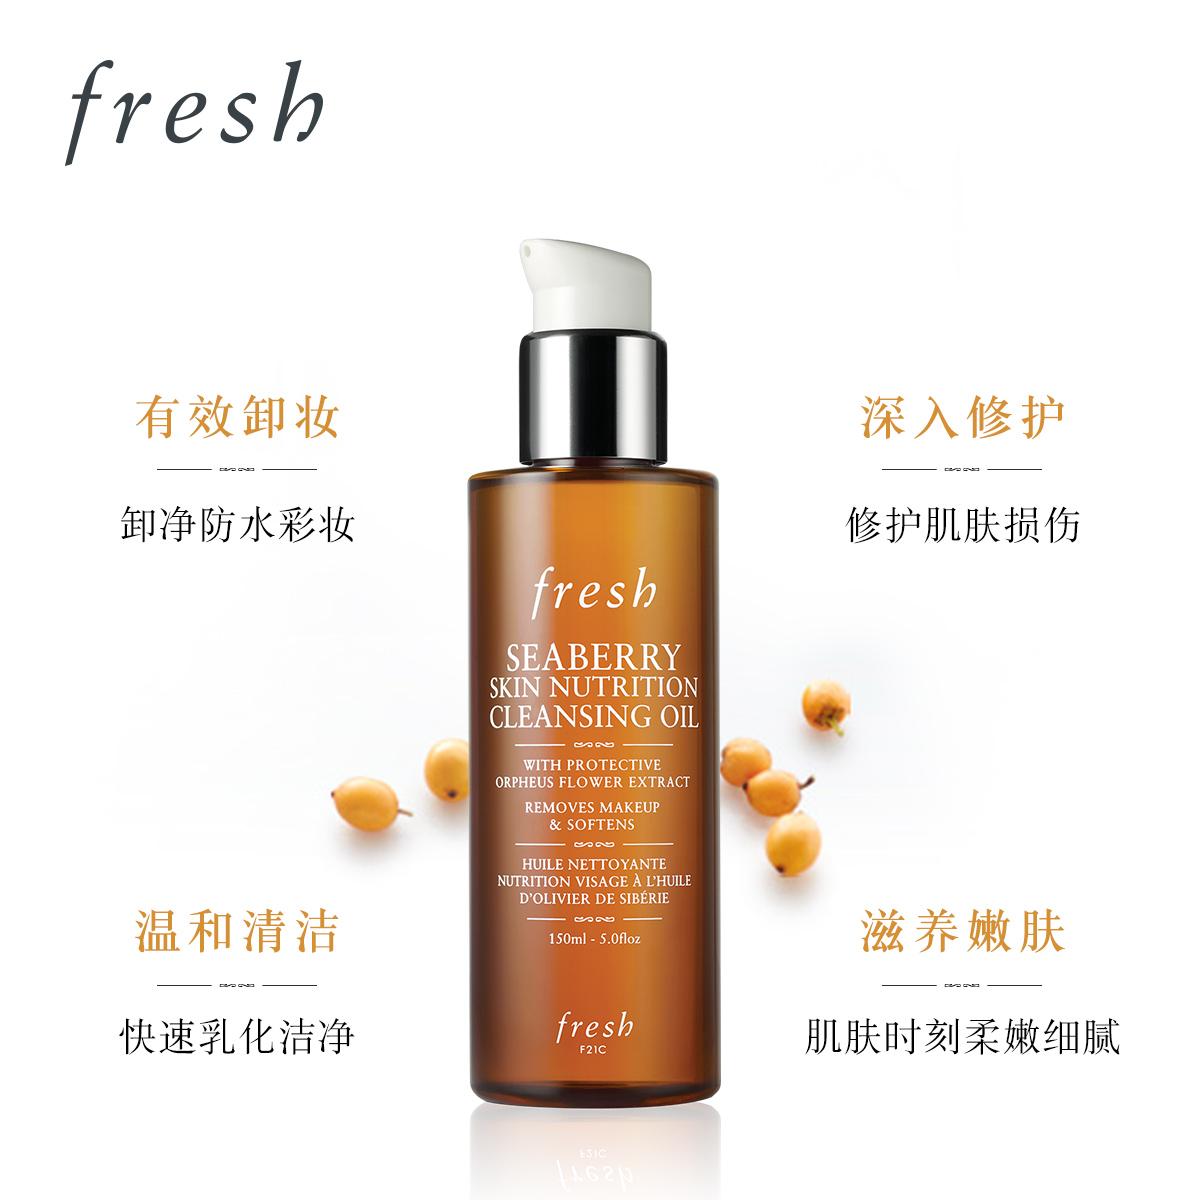 150ml  有效卸妝 溫和清潔 Fresh 馥蕾詩海莓修復保濕潔顏油